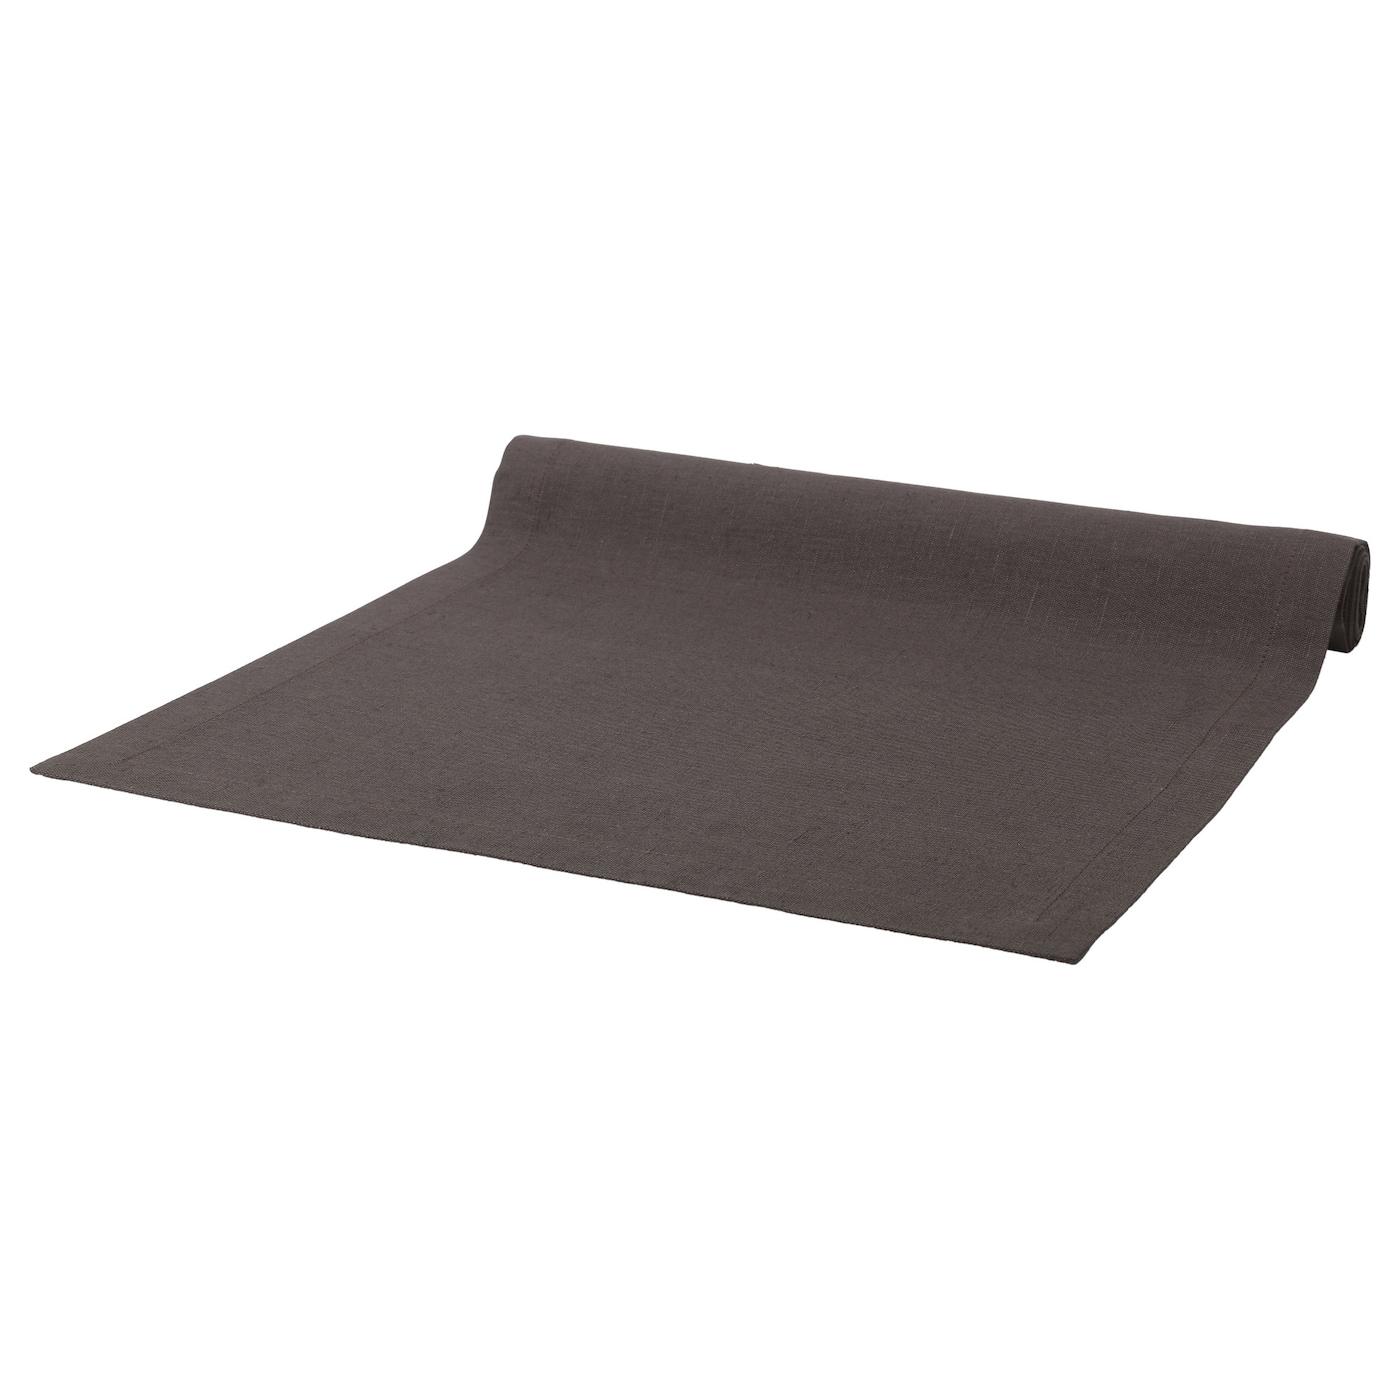 marknad chemin de table noir 40x140 cm ikea. Black Bedroom Furniture Sets. Home Design Ideas